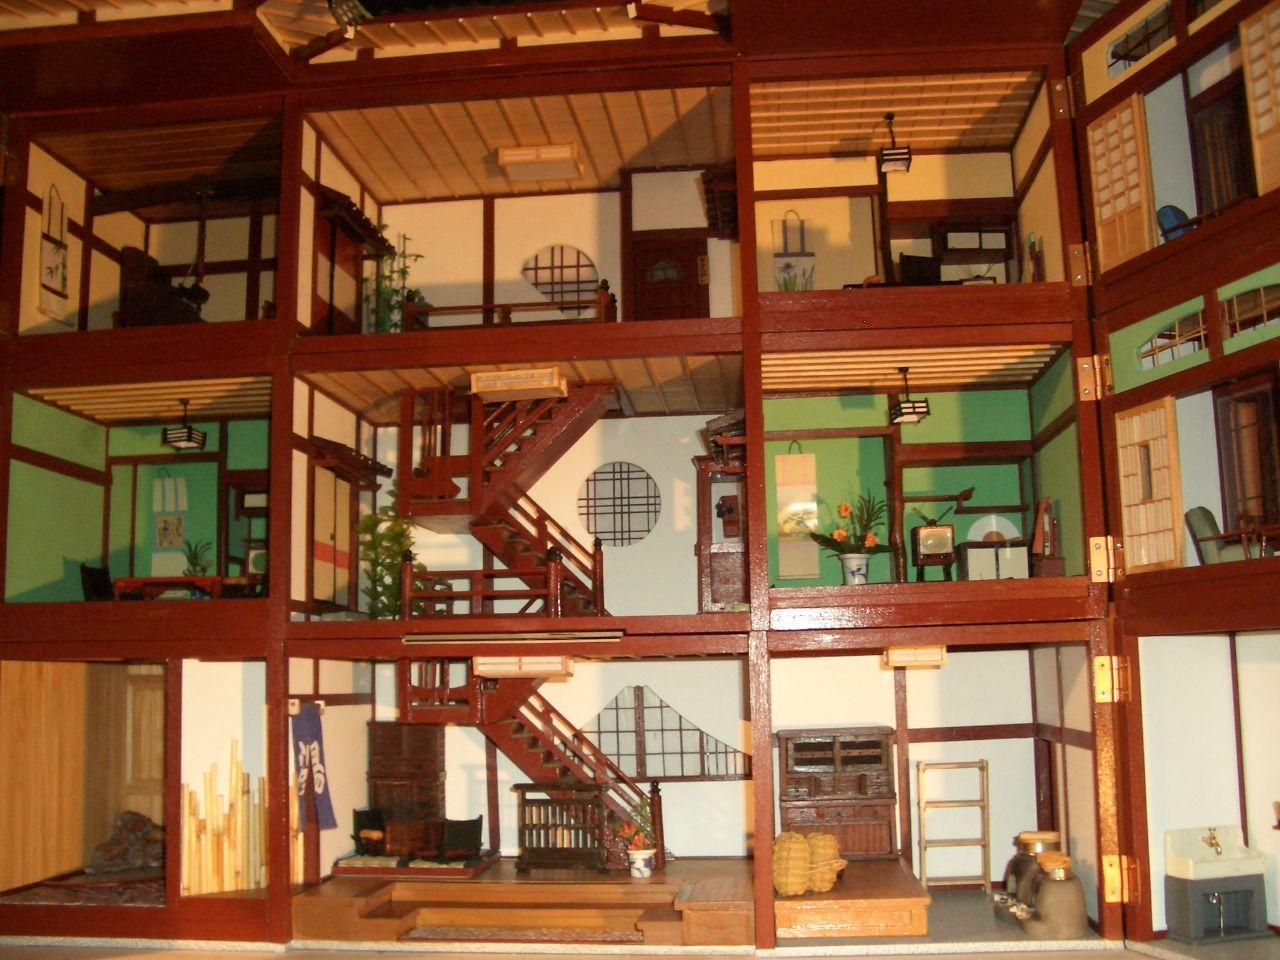 Interior View Of The Japanese Dollhouse ハウス ドールハウス